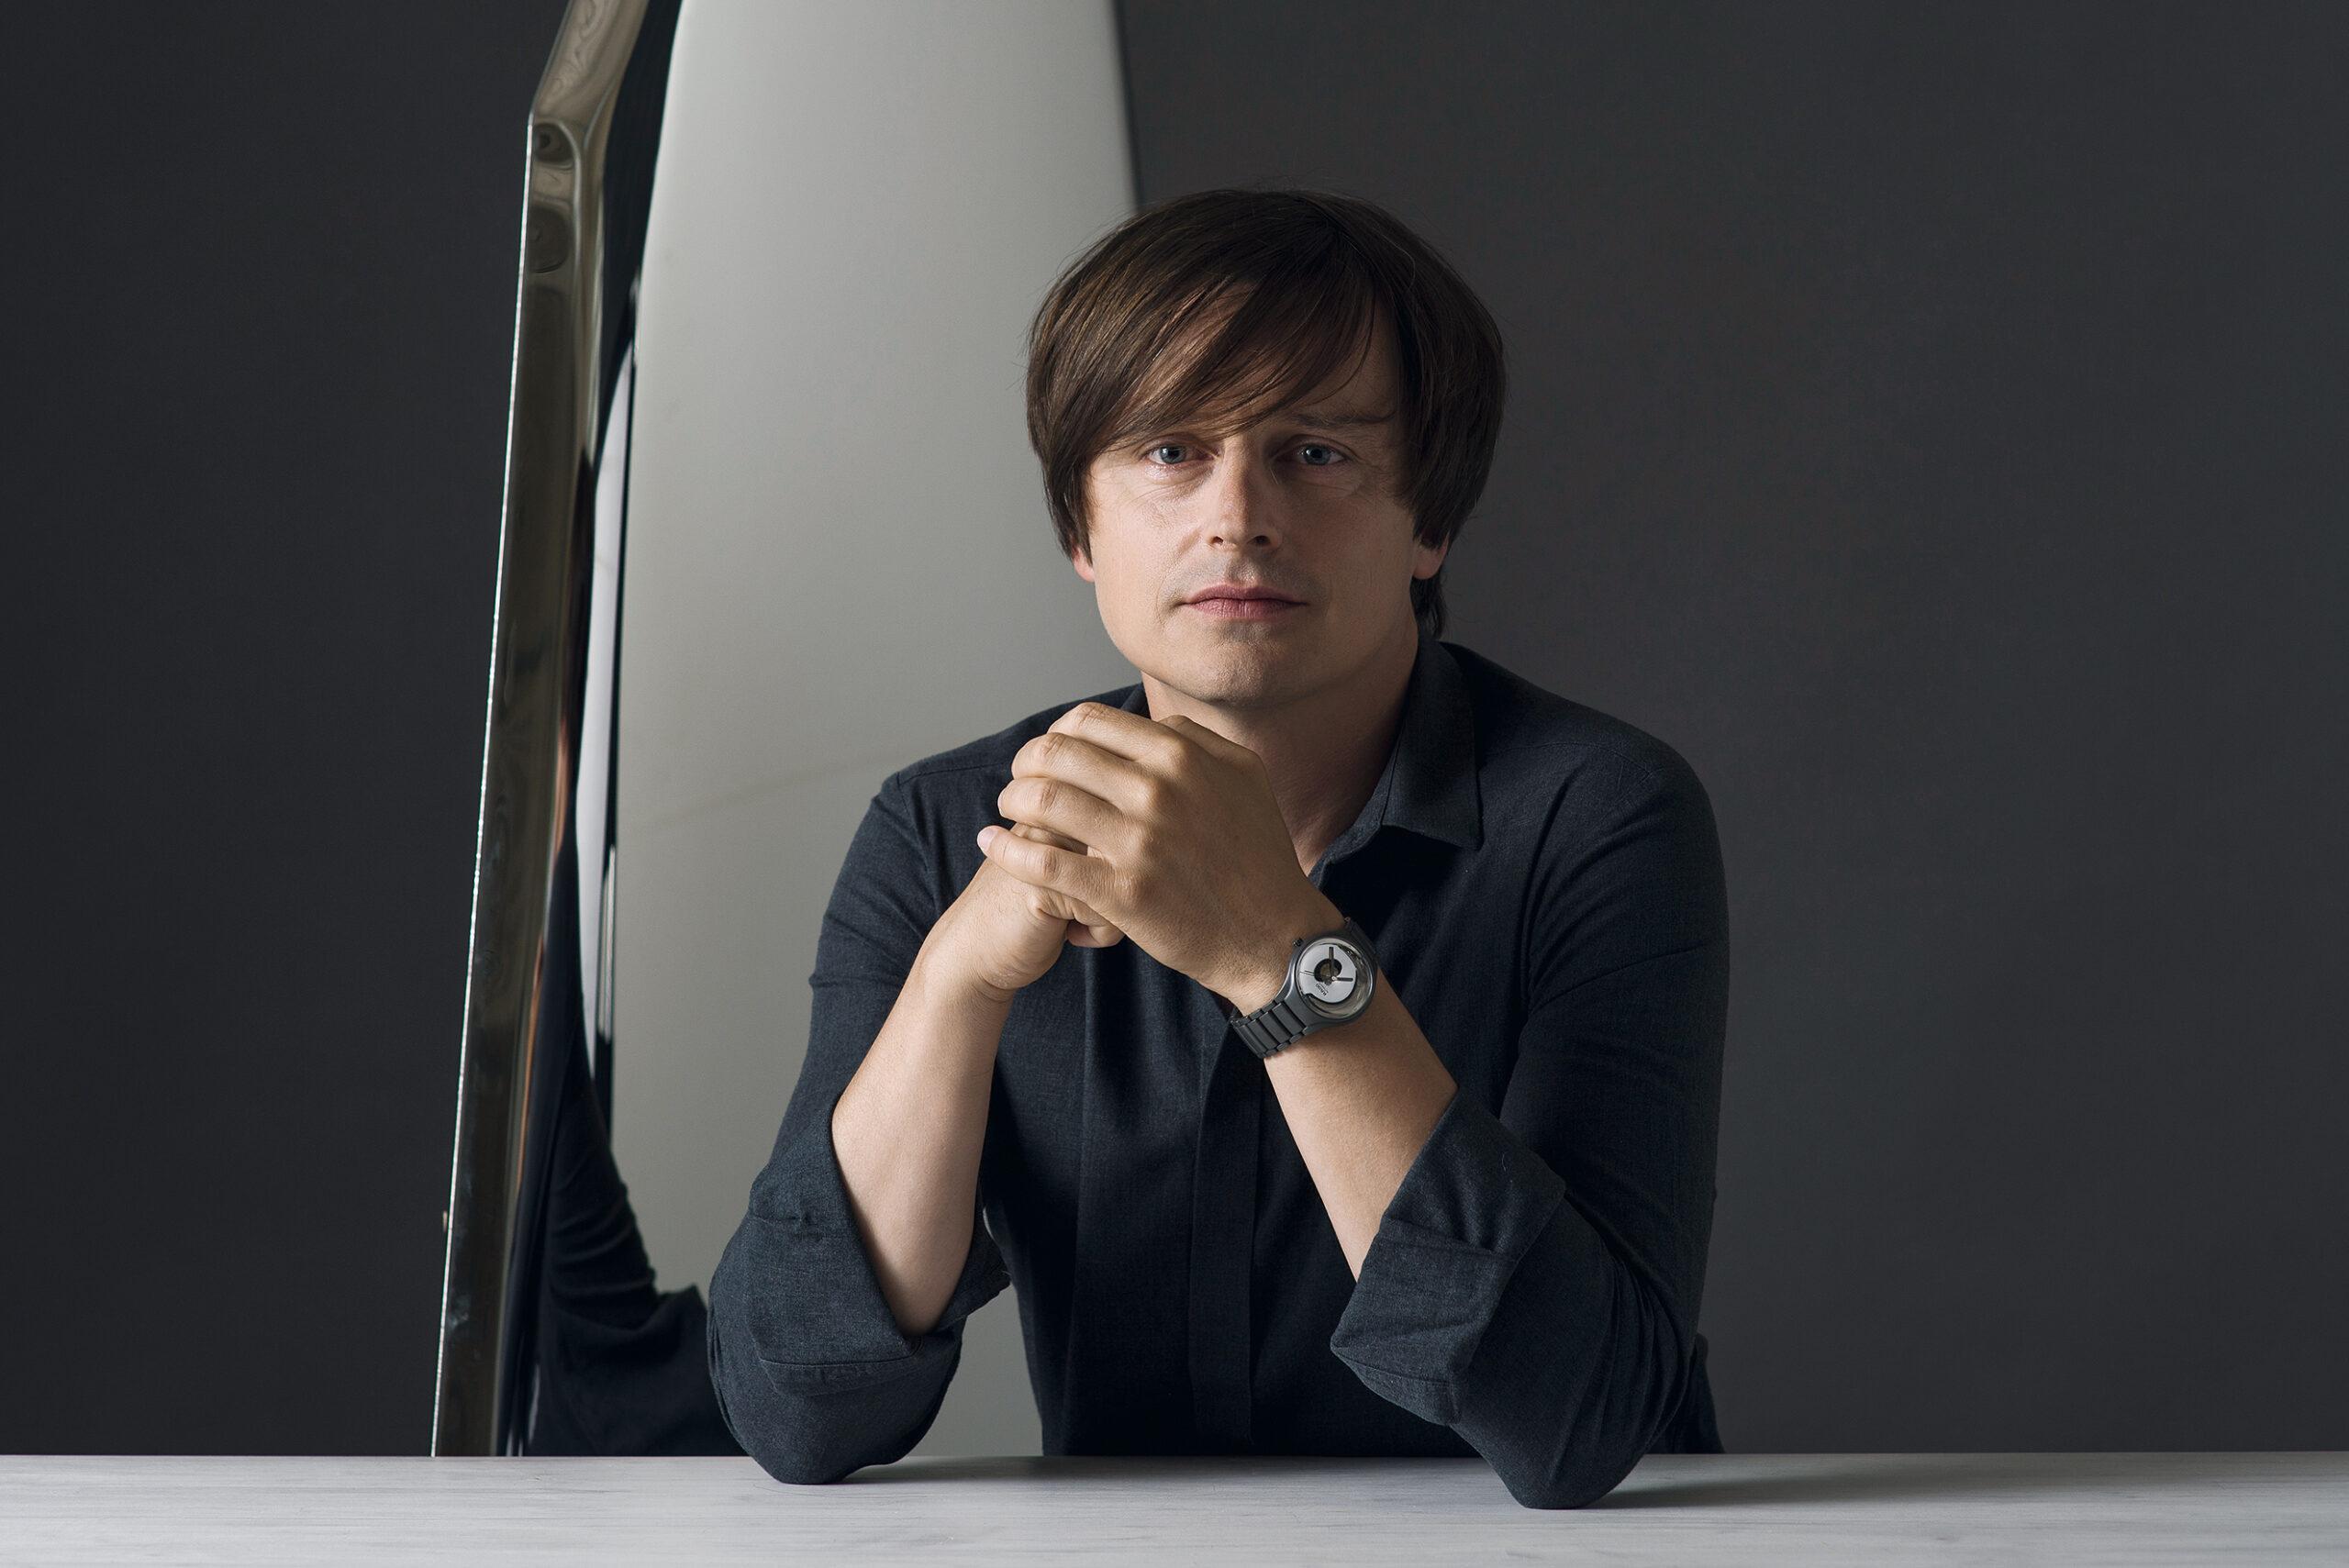 Polish architect Oskar Zieta